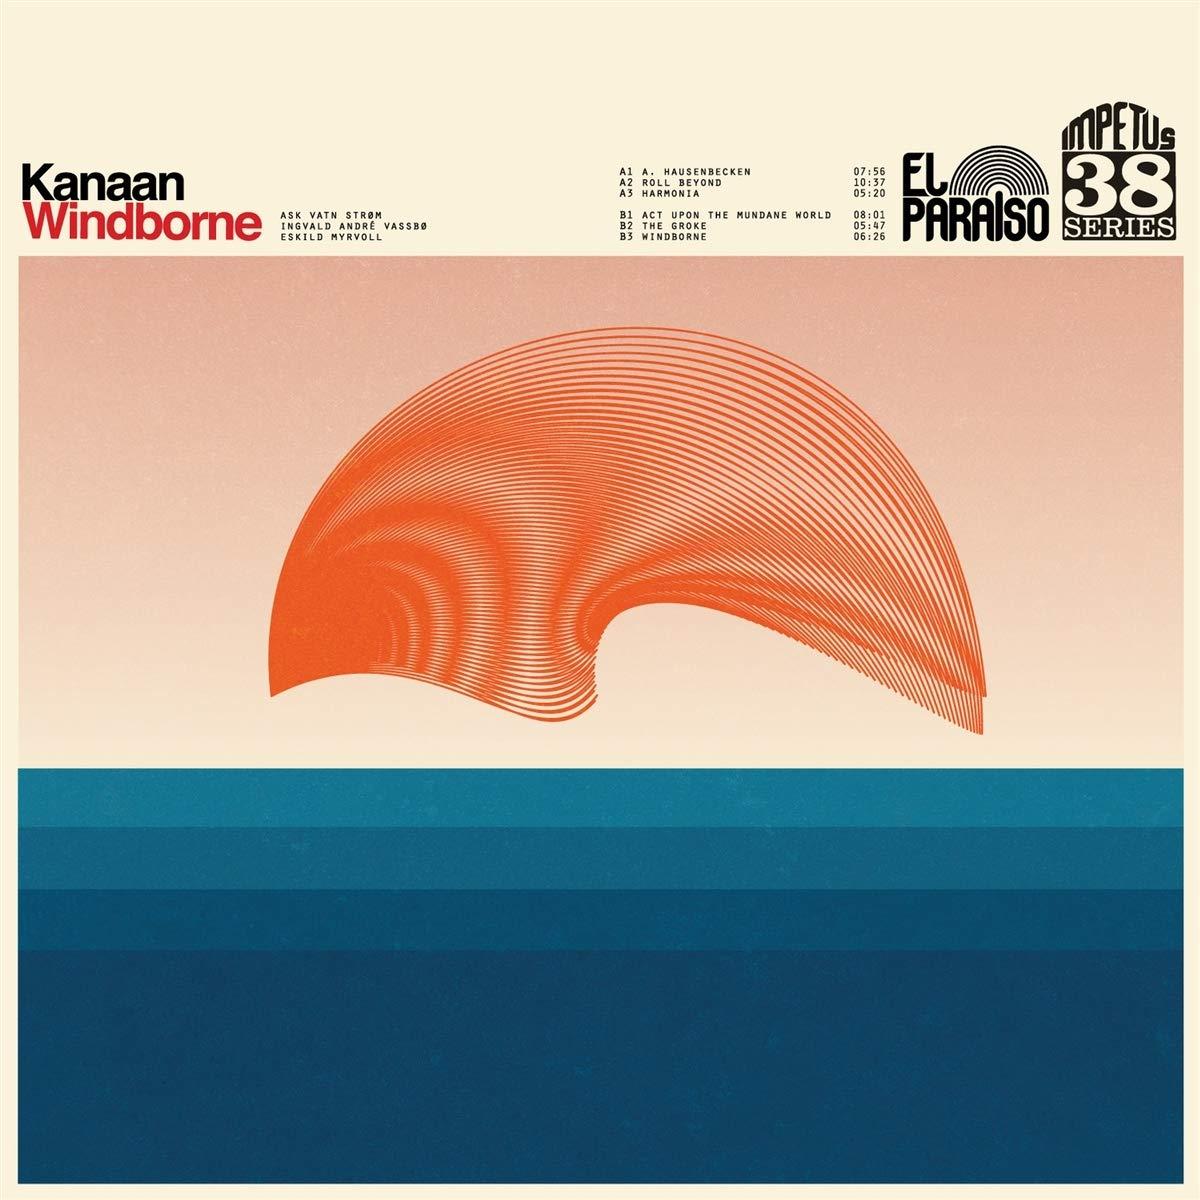 Windborne Cover art